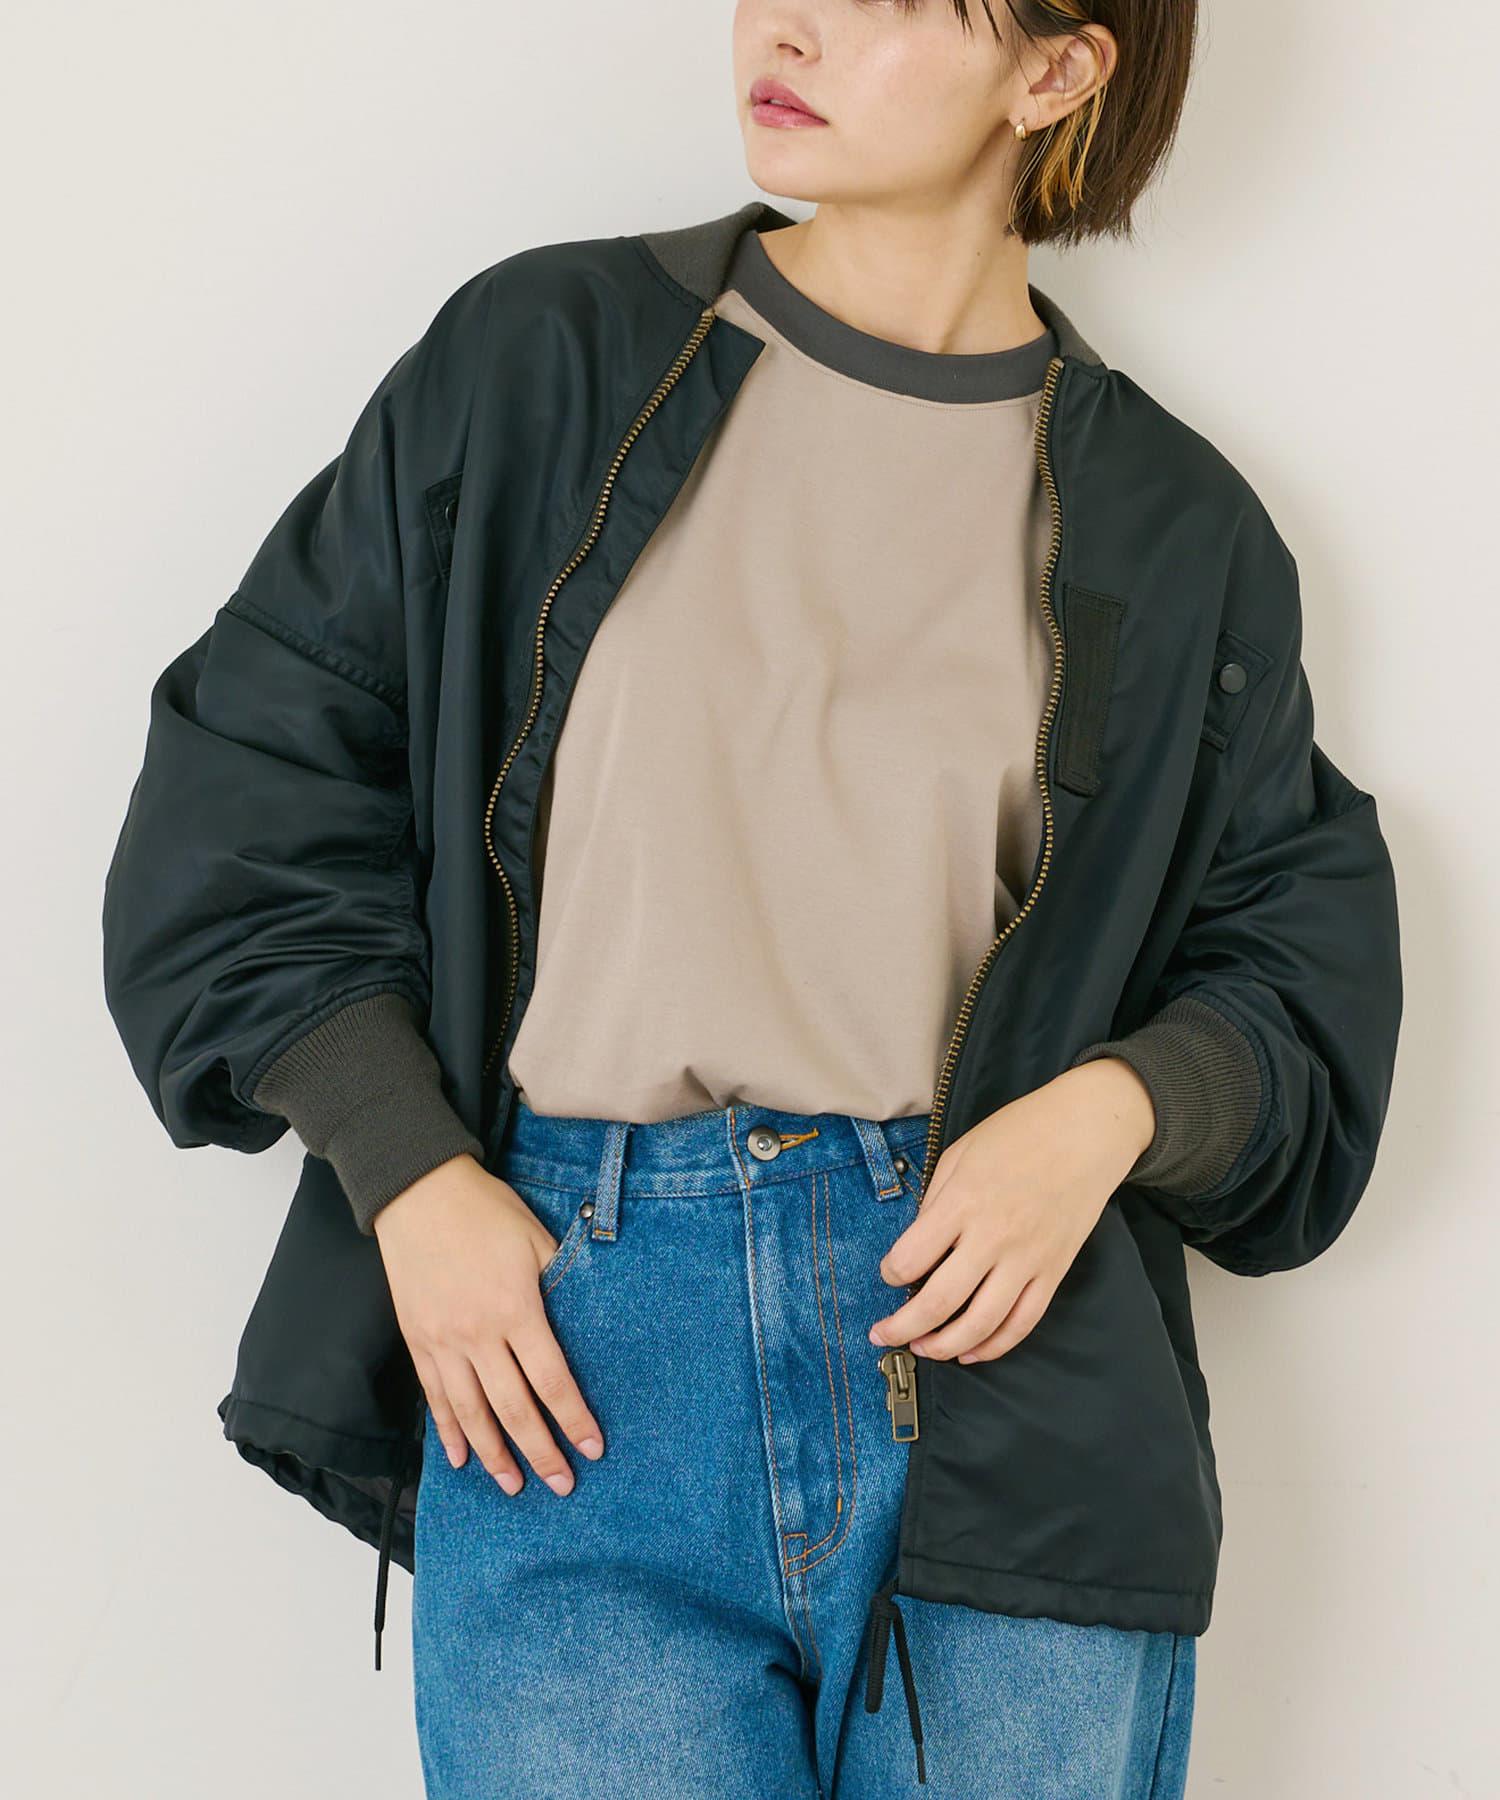 COLLAGE GALLARDAGALANTE(コラージュ ガリャルダガランテ) 【VOTE MAKE NEW CLOTHES】MA-1 コーチジャケット